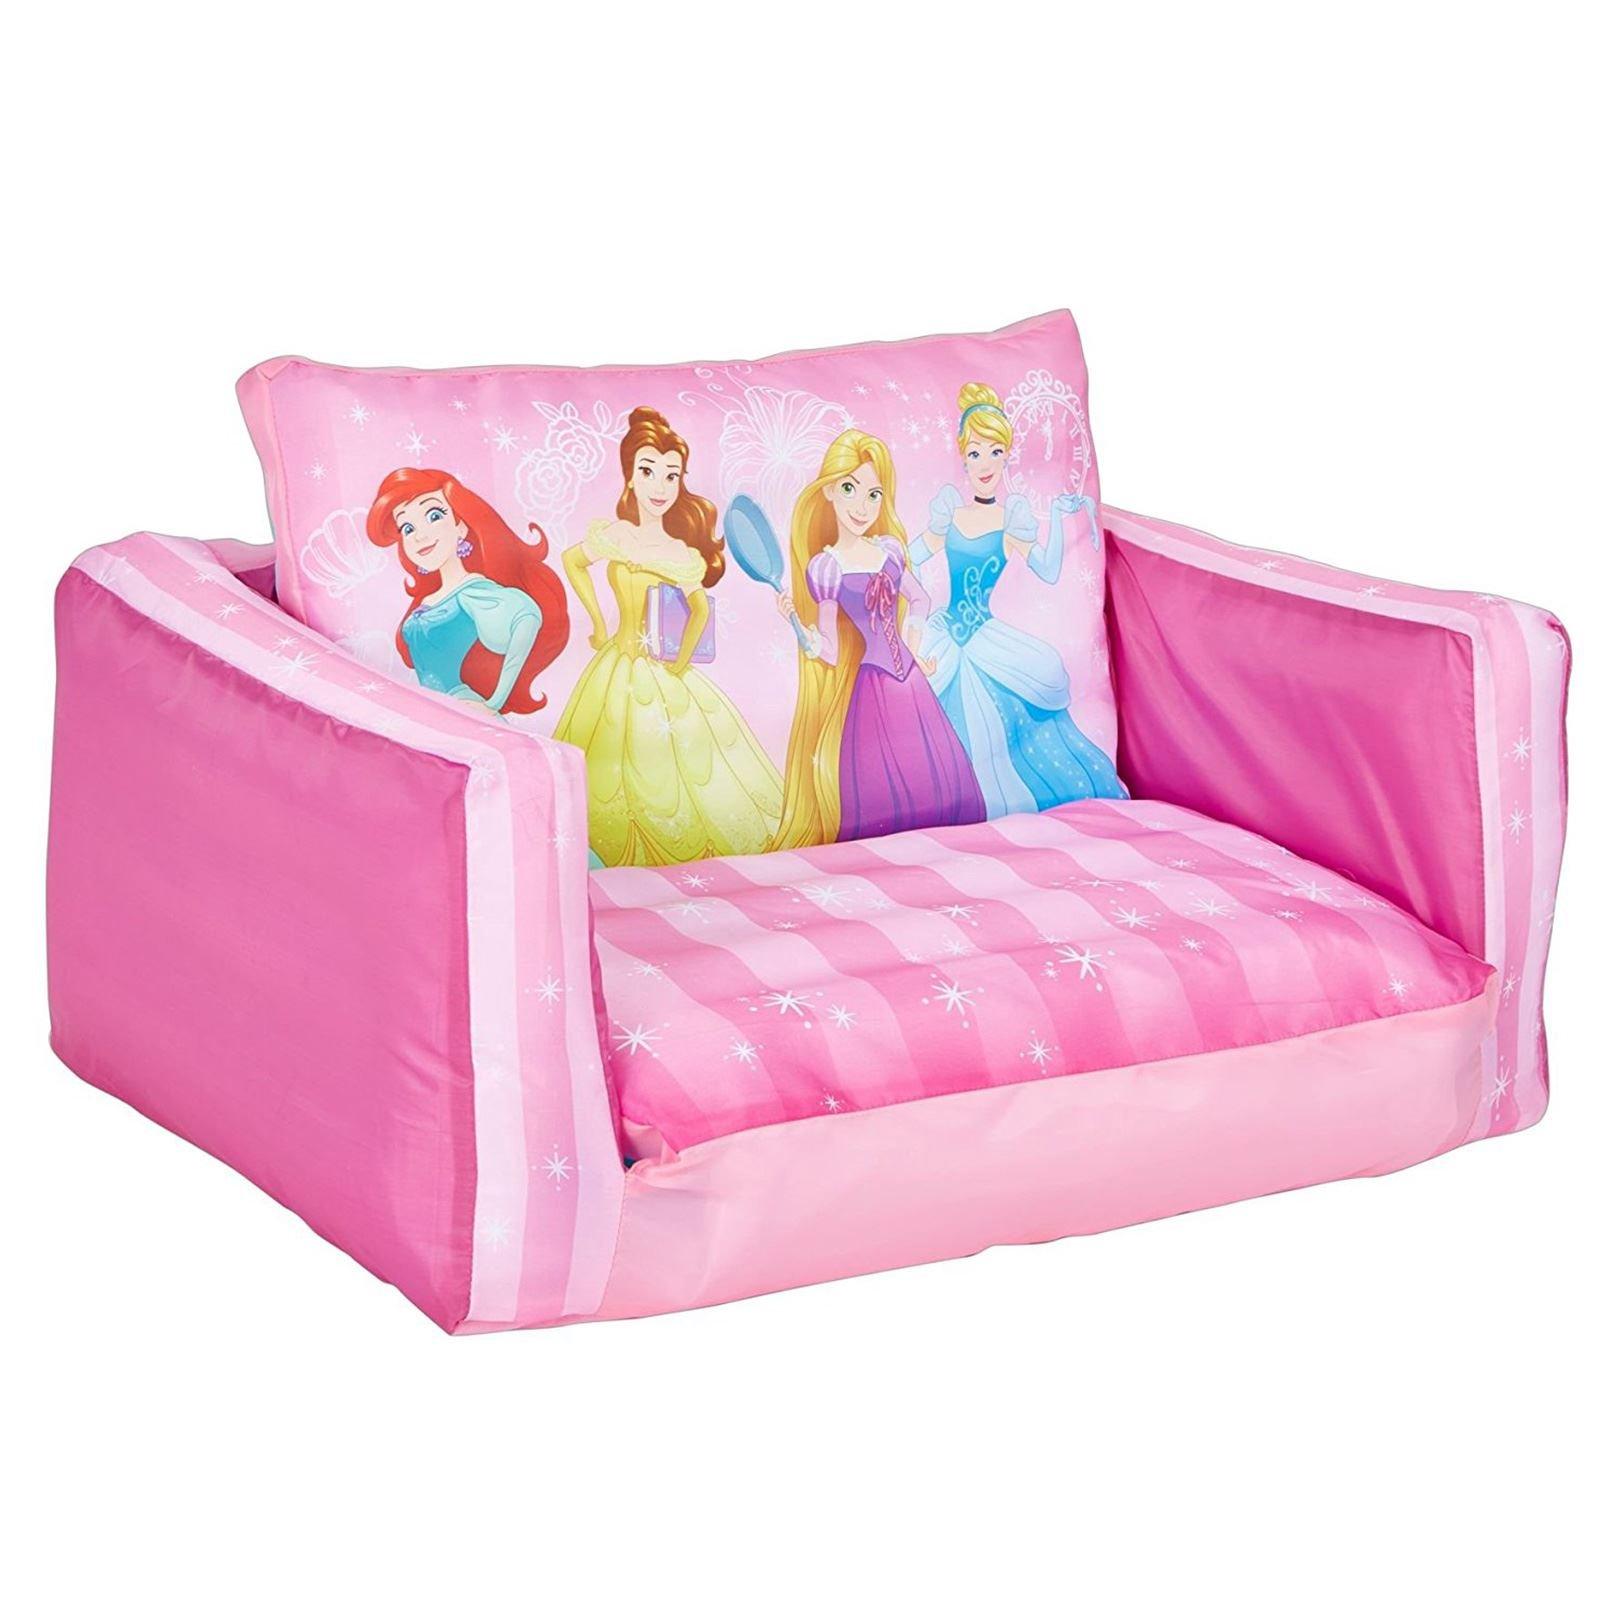 Disney Princess Inflatable Flip Out Sofa by Disney Princess